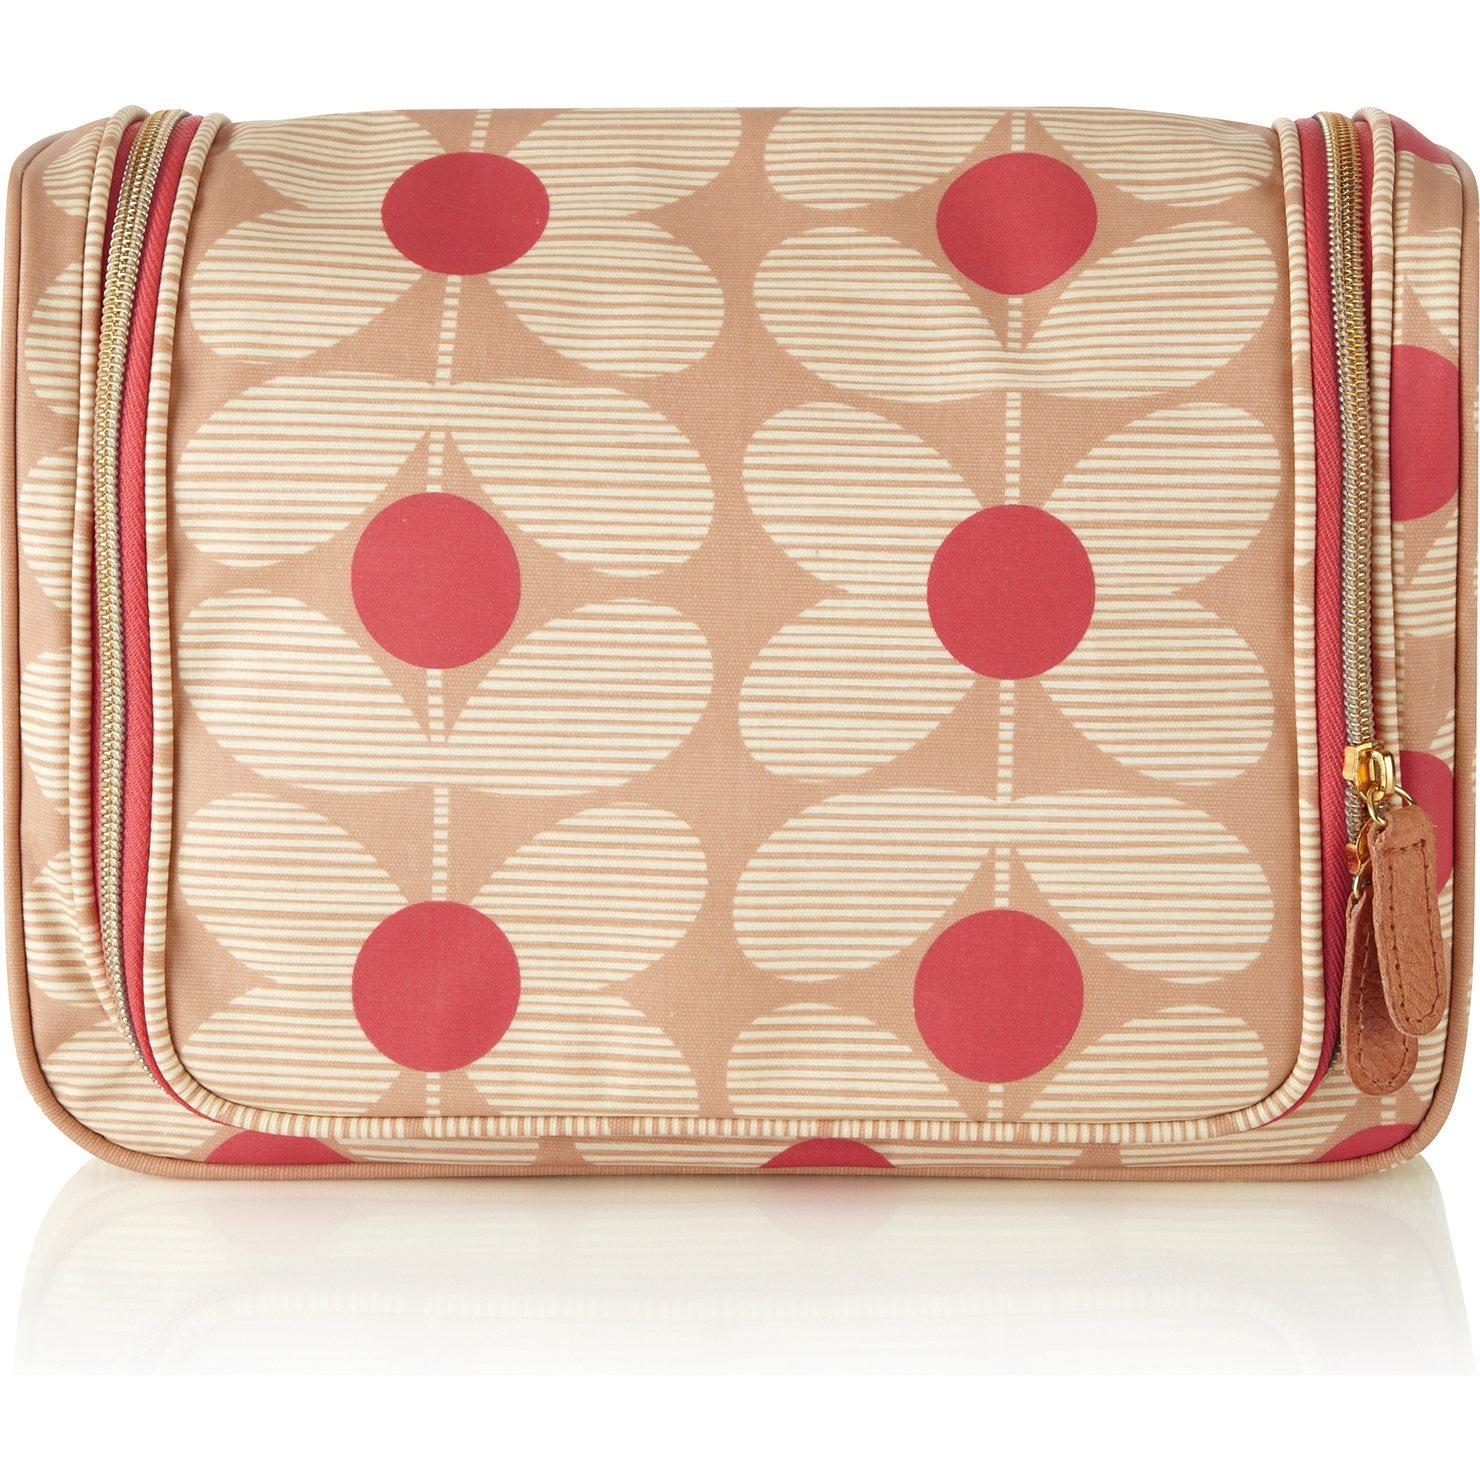 Orla Kiely Sixties Stem Hanging Wash Bag, Beige/Pink